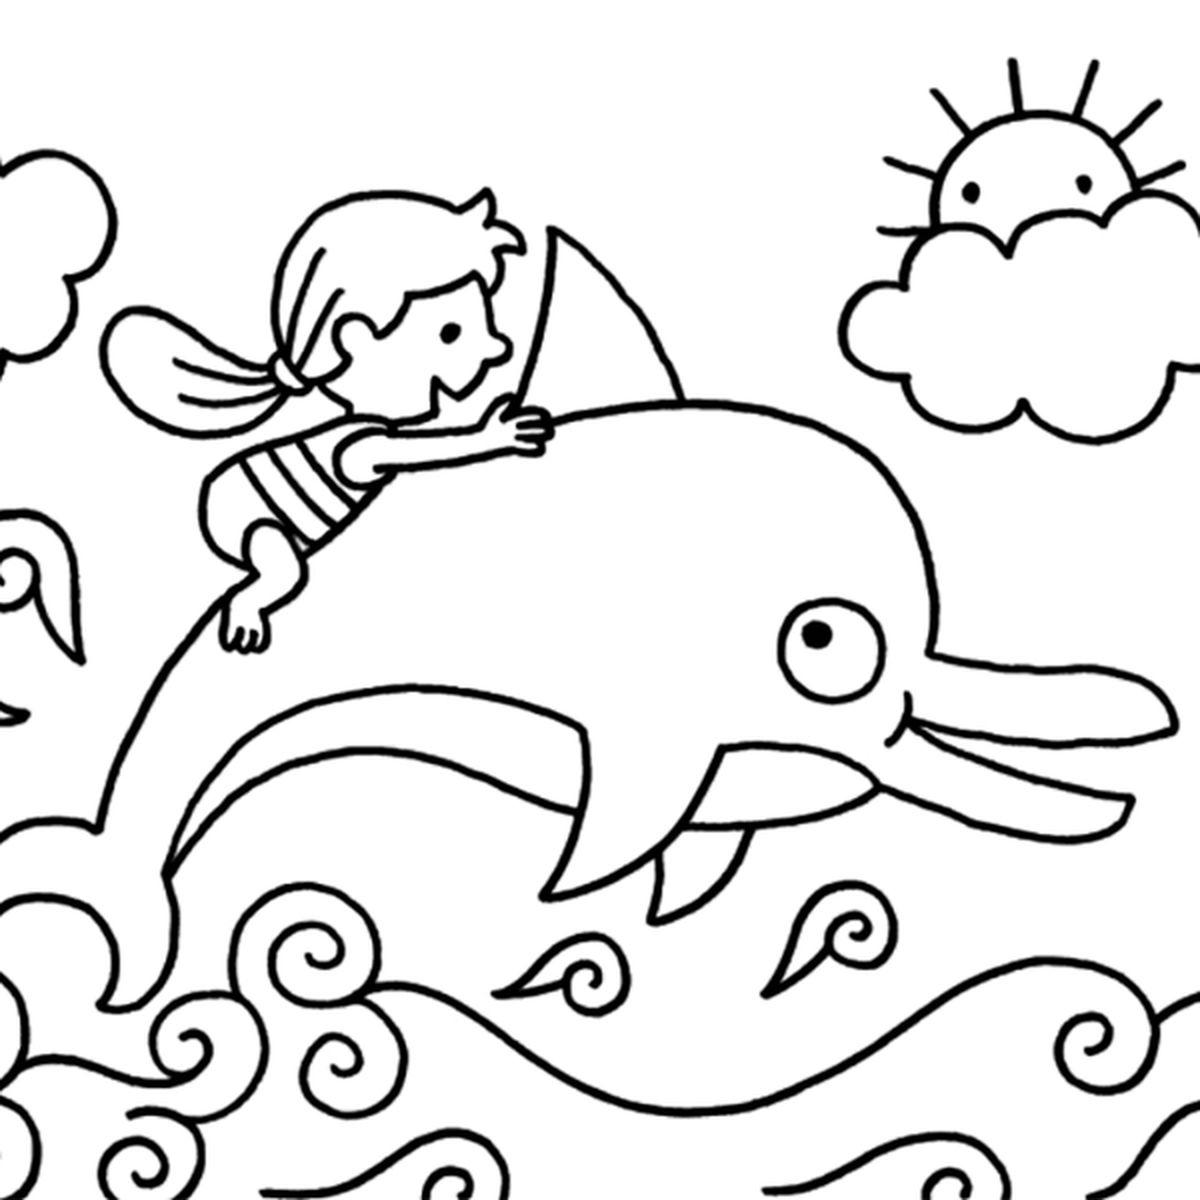 Le dauphin |